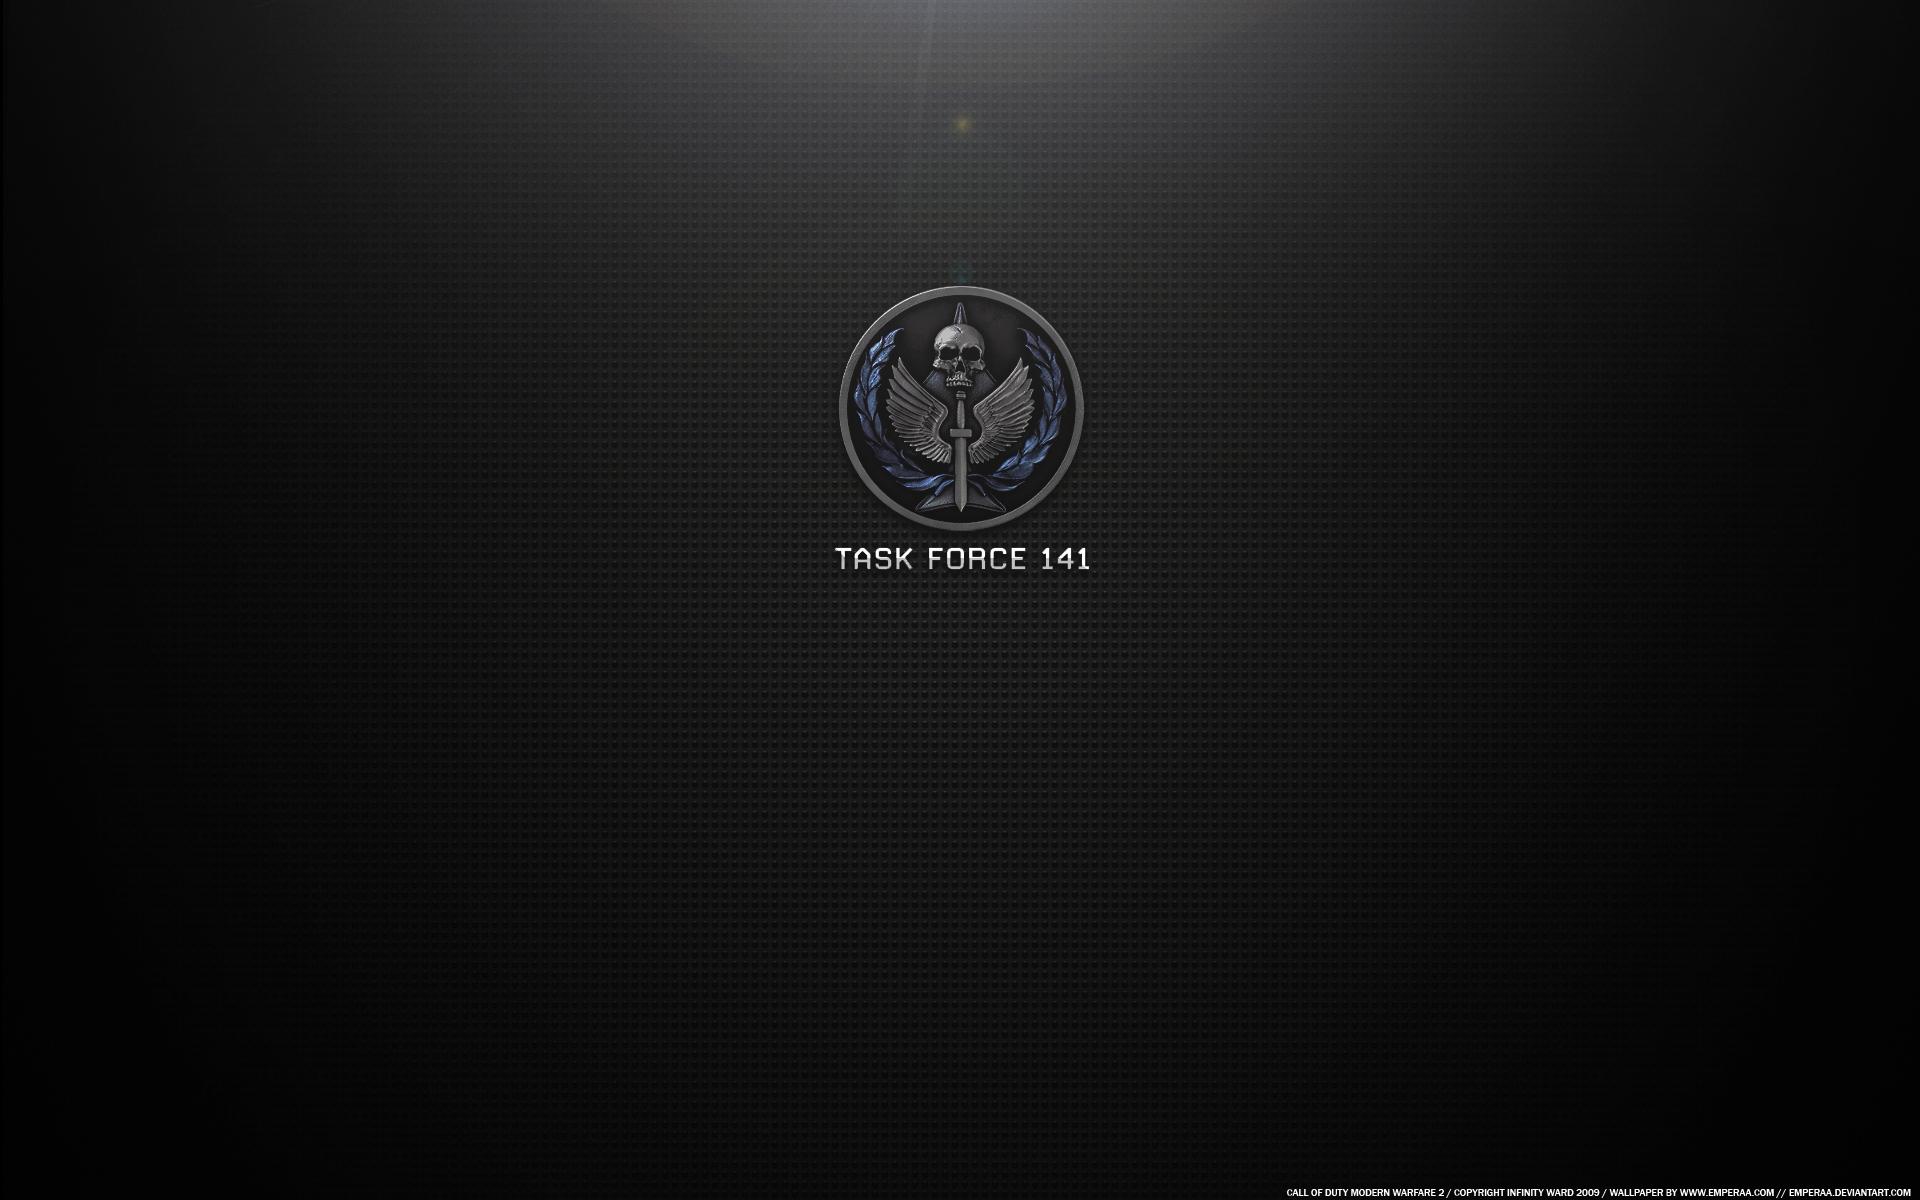 Task Force 141 by emperaa